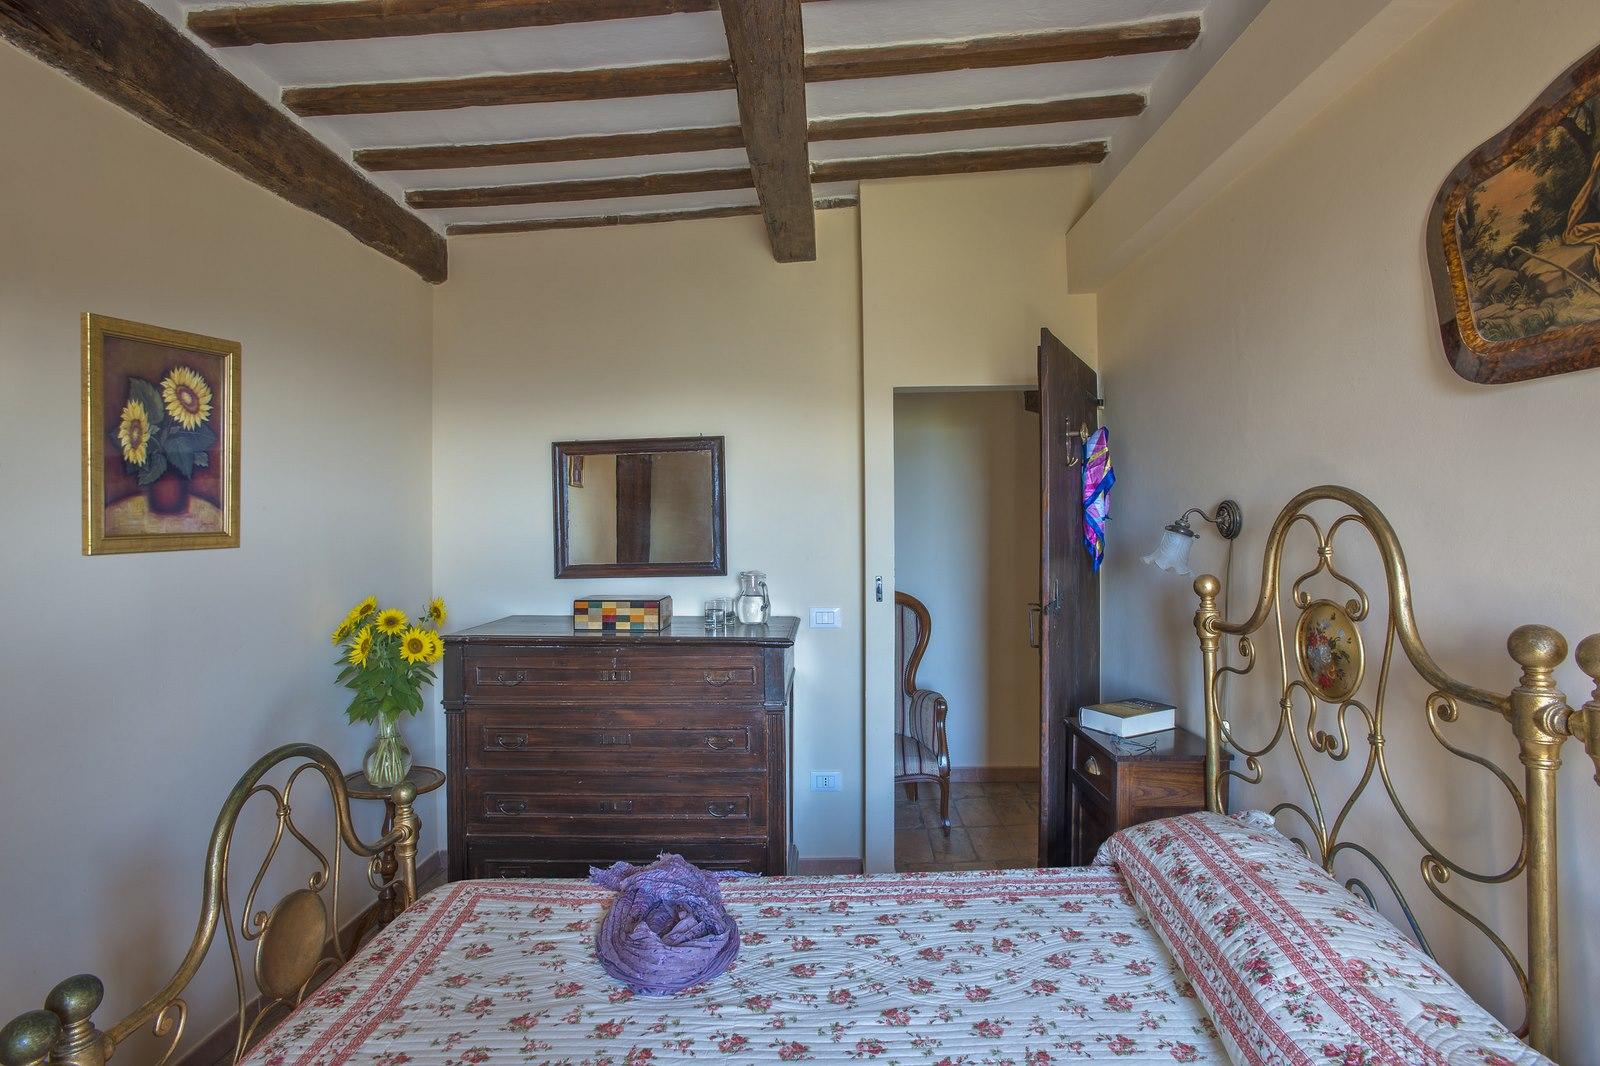 Ferienhaus La Quiete dei Re (2236092), Cagli, Pesaro und Urbino, Marken, Italien, Bild 8